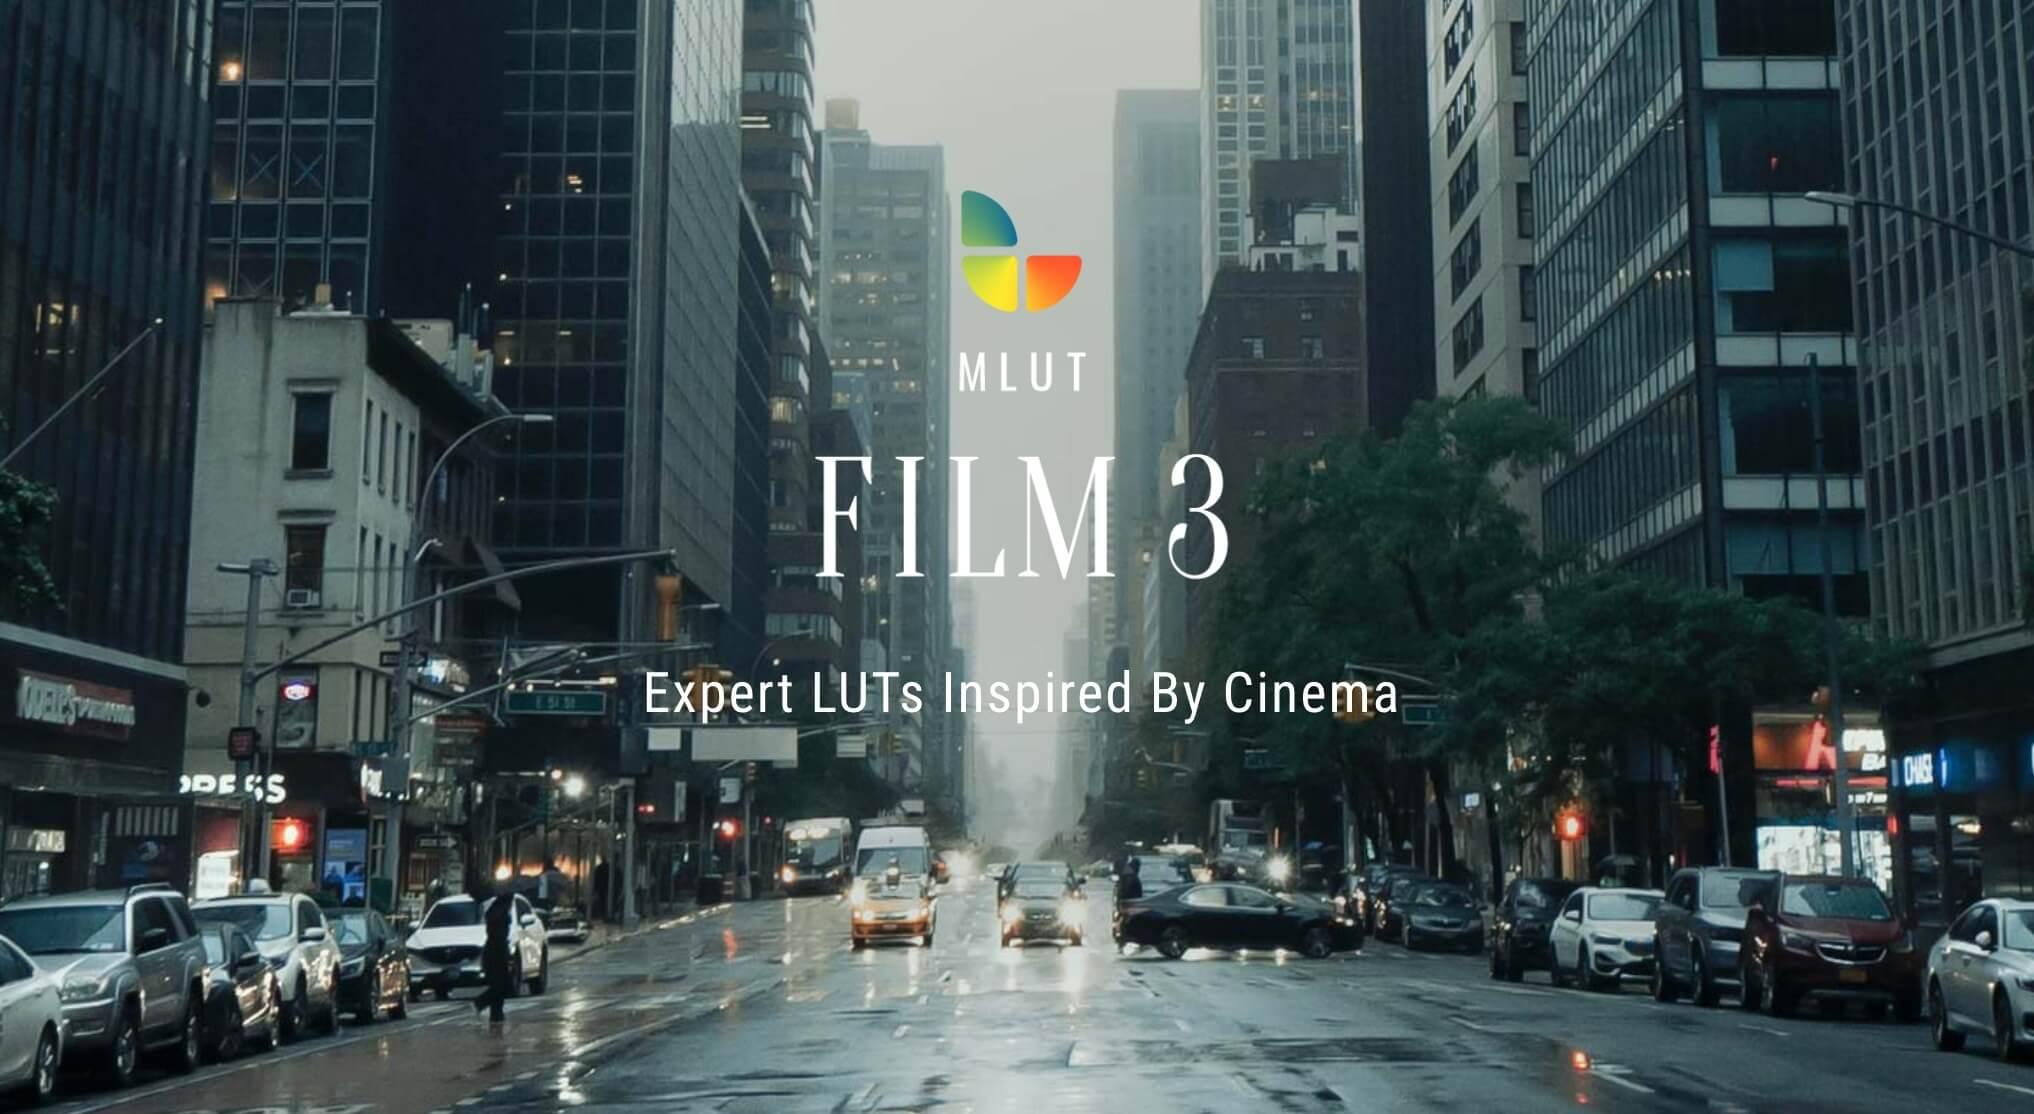 LUTs预设 50组专业电影调色预设 MotionVFX mLUT Film 3